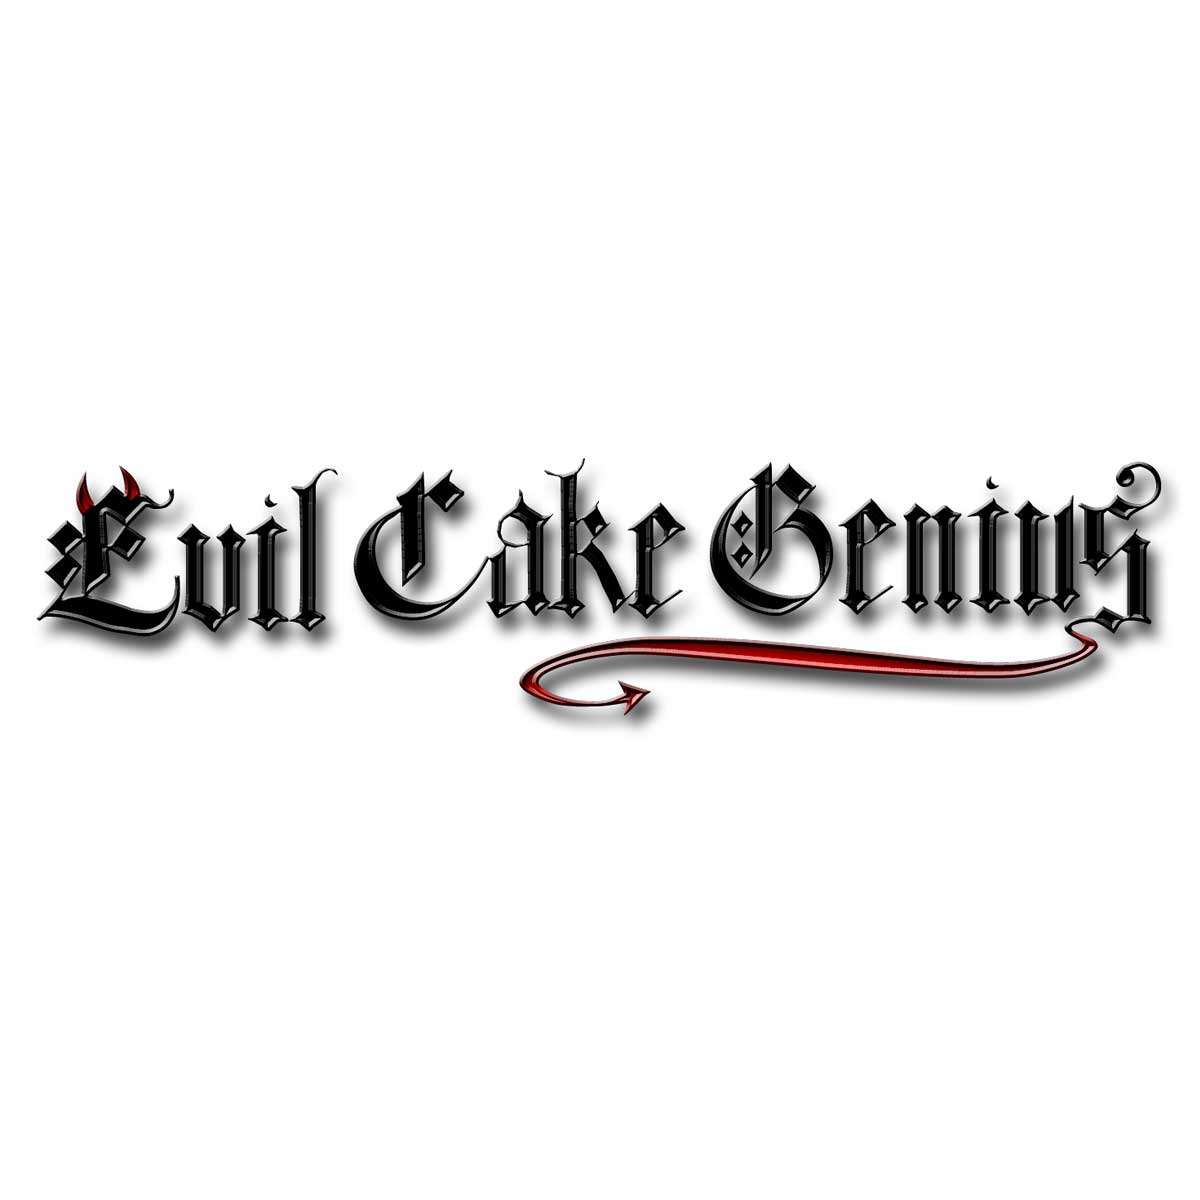 Cake Decorating Supplies Catalog